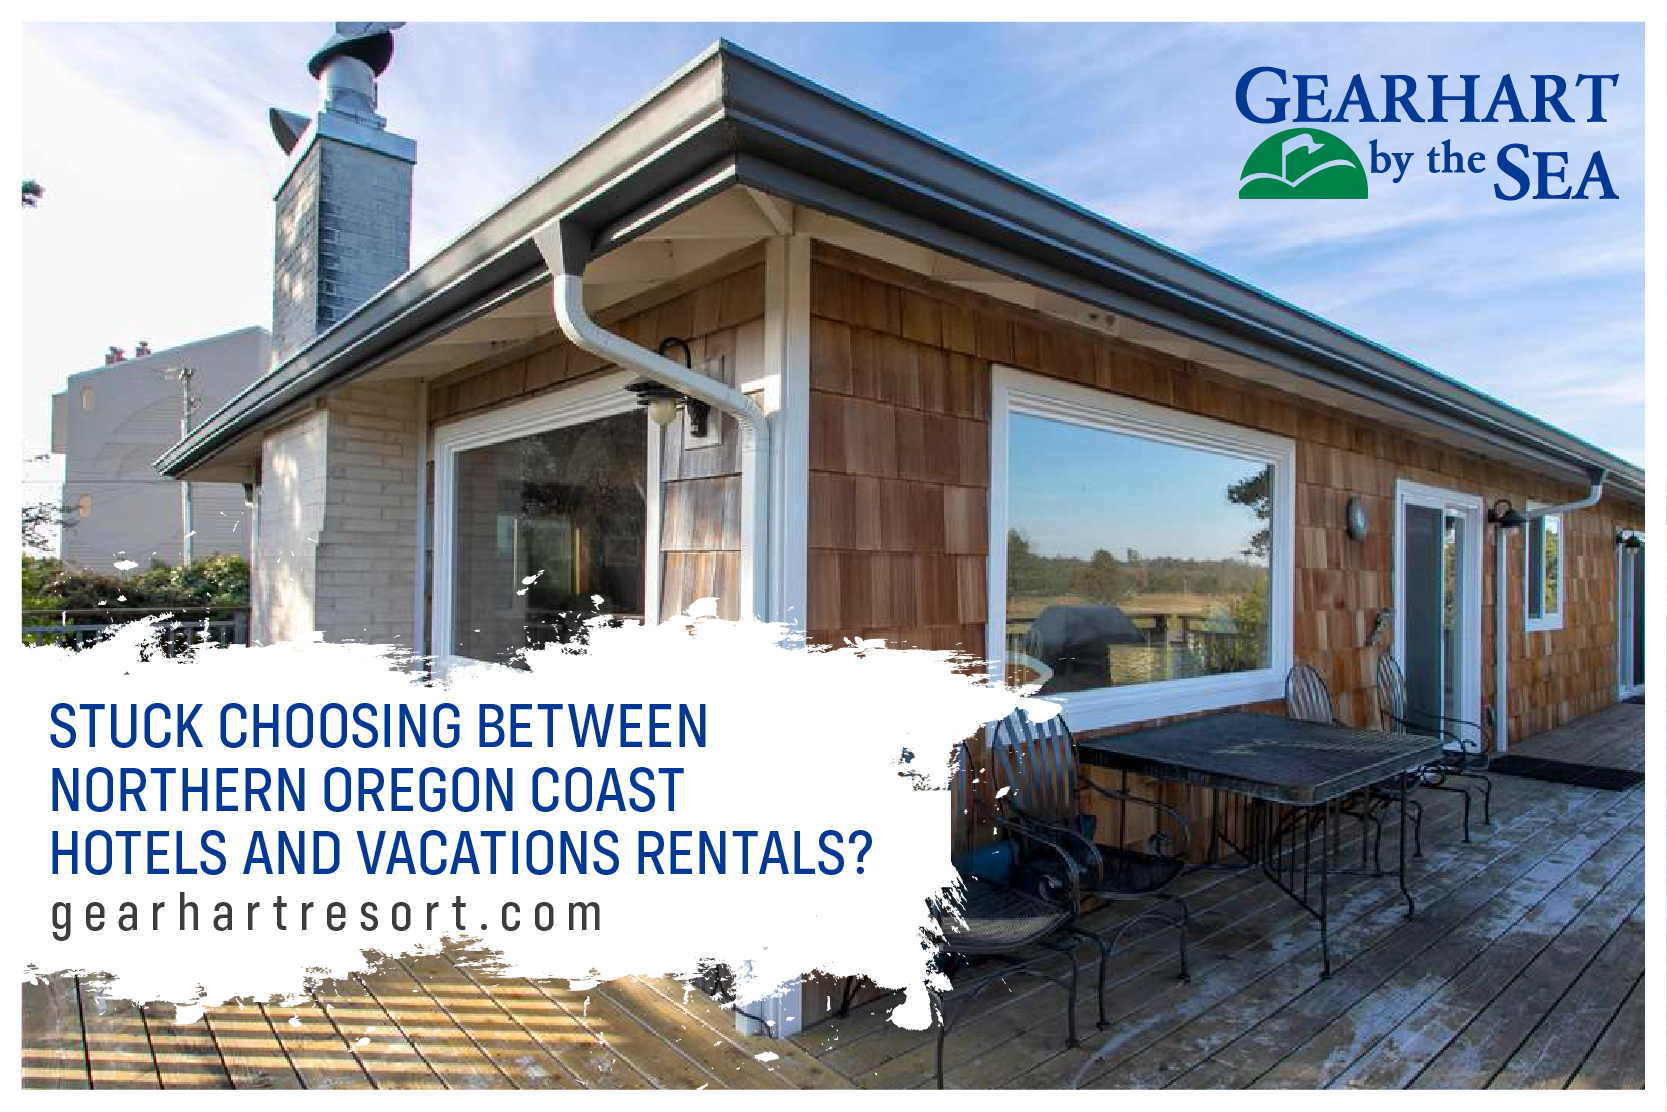 Choosing Between Northern Oregon Coast Hotels and Vacation Rentals?